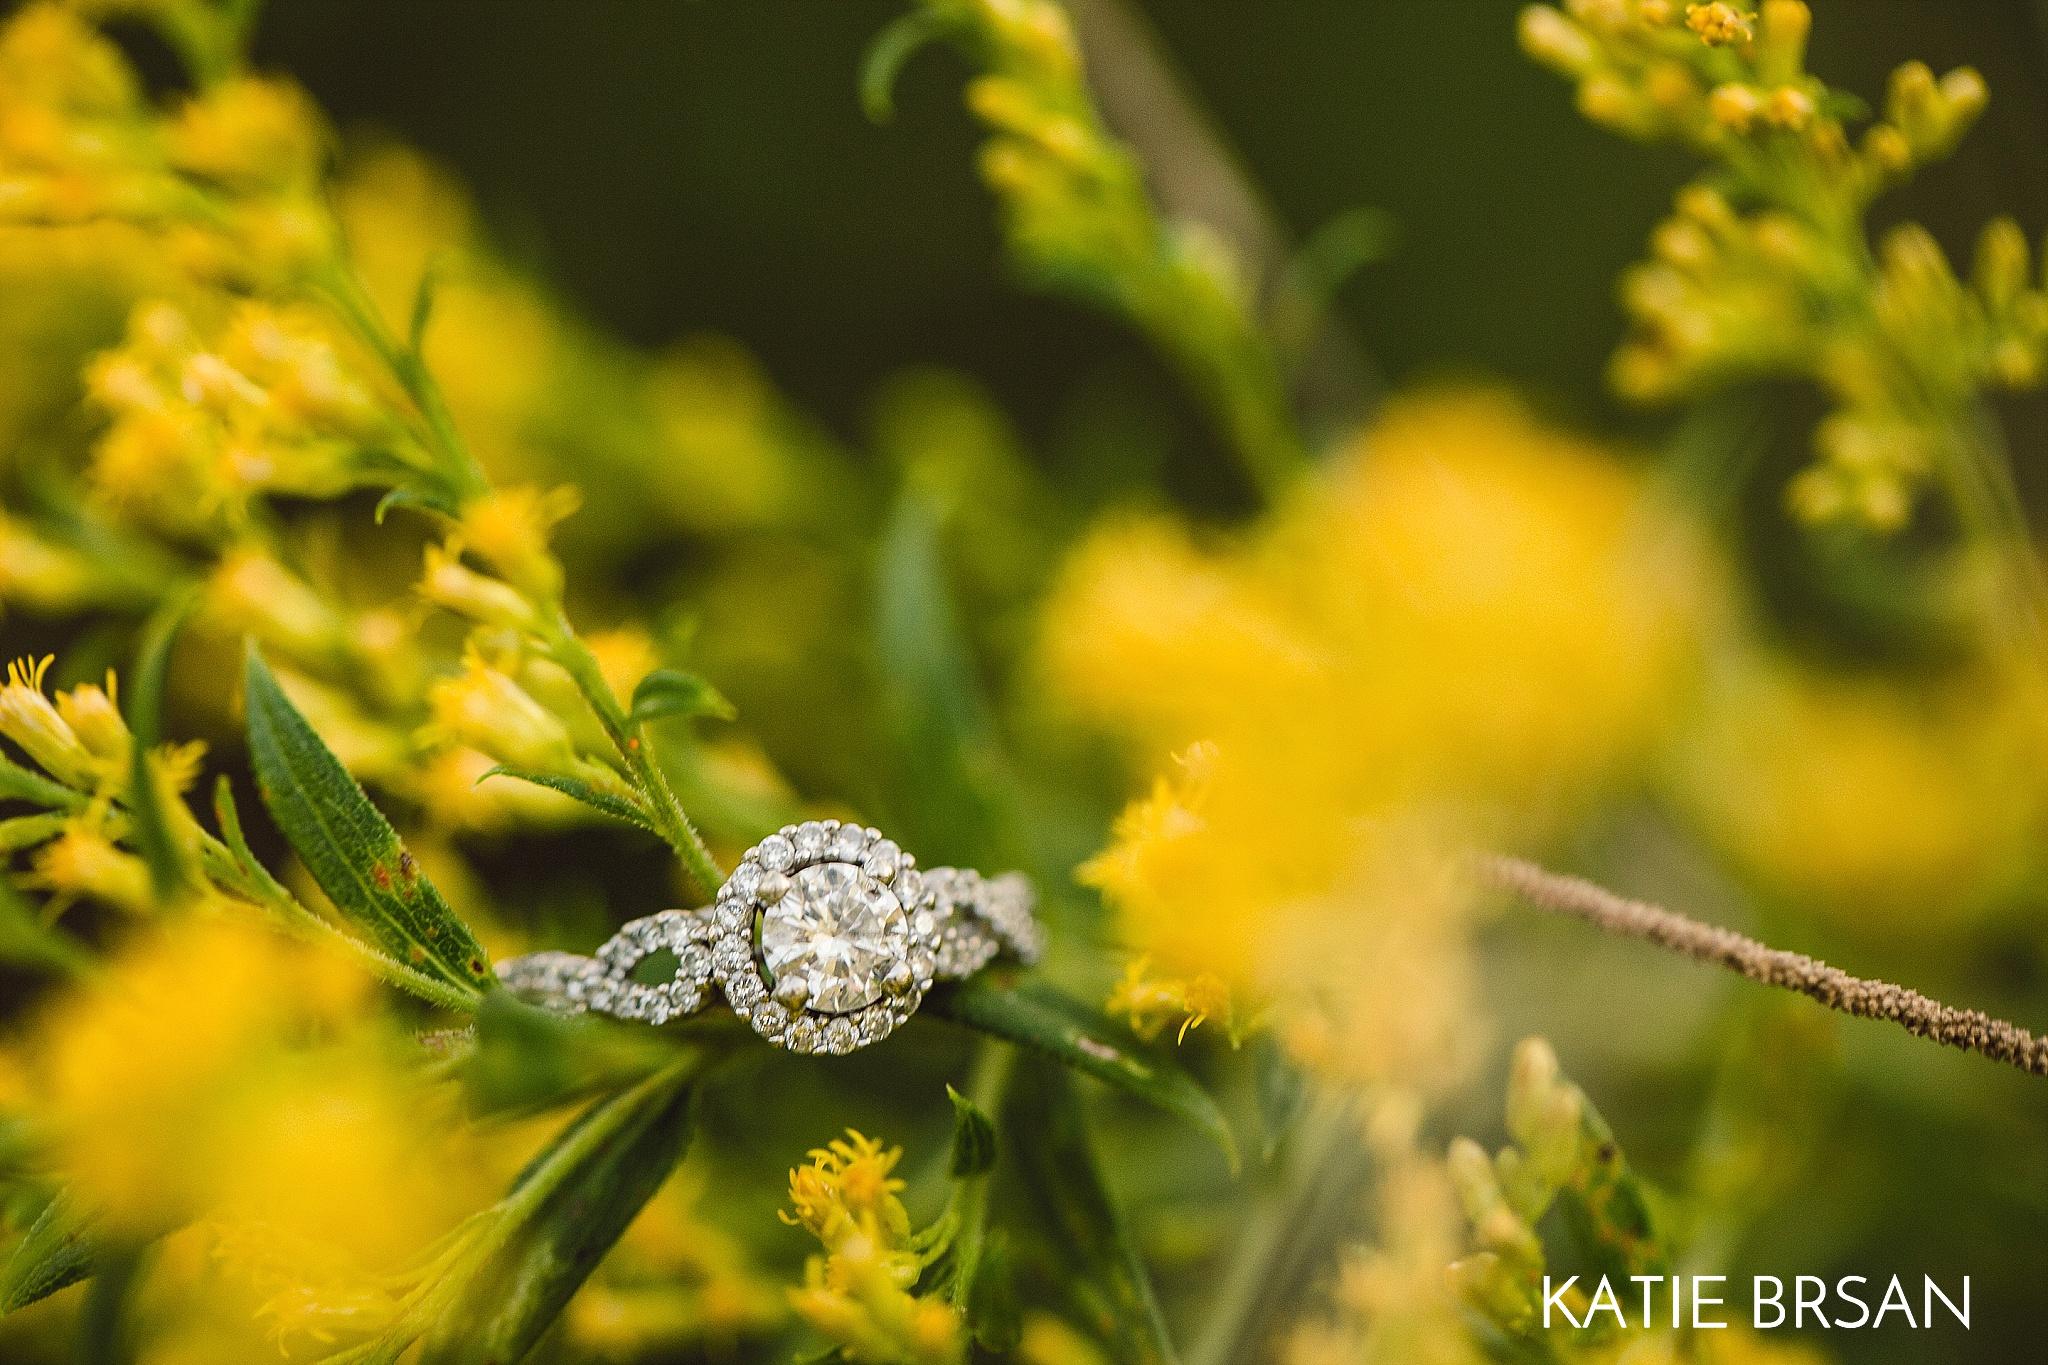 KatieBrsan-Chicago-Suburban-EngagementPictures-HadlyValley_0580.jpg